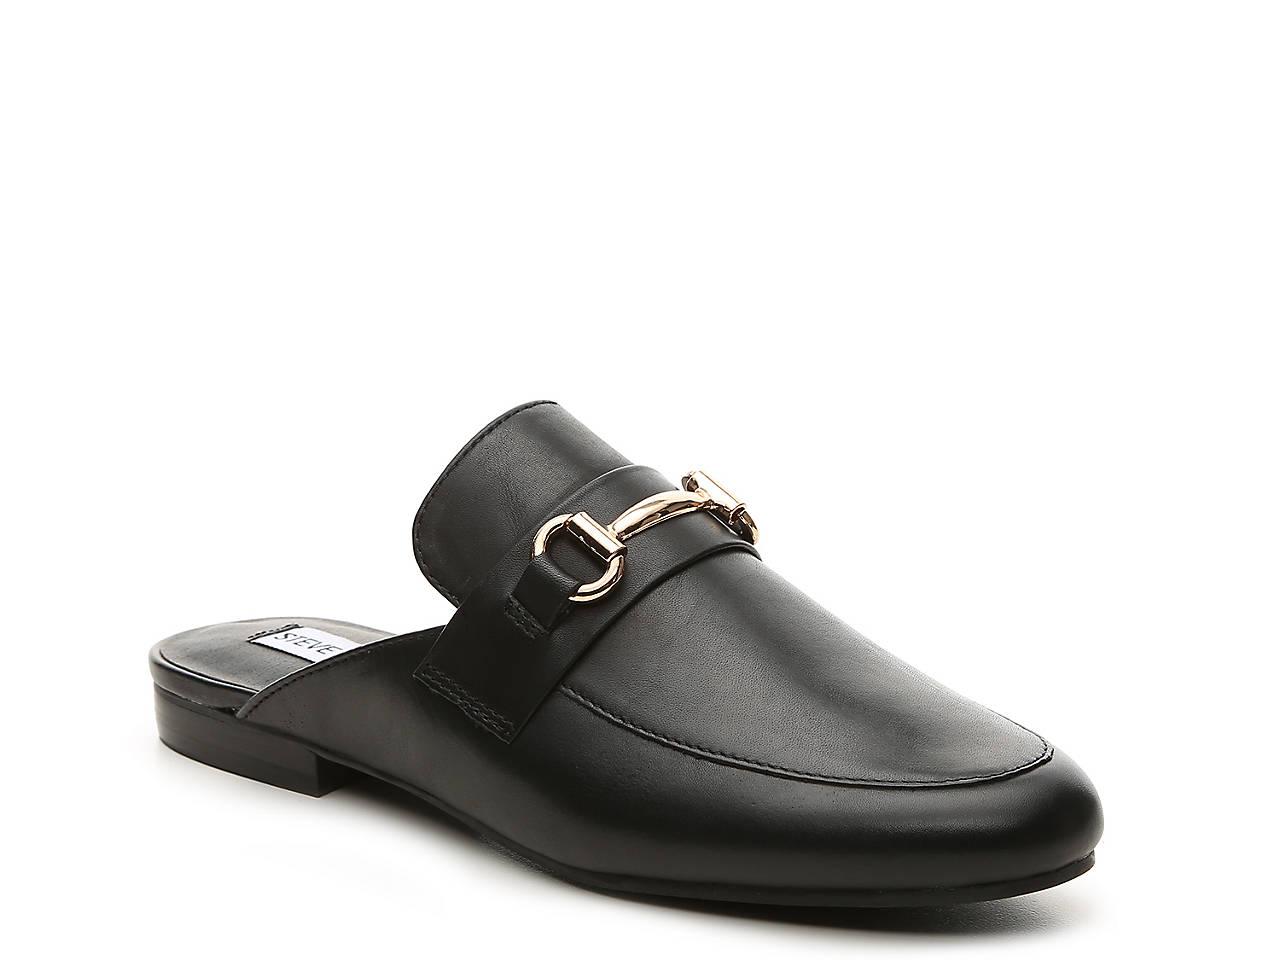 d40a76af12c Steve Madden Kandi Mule Women s Shoes